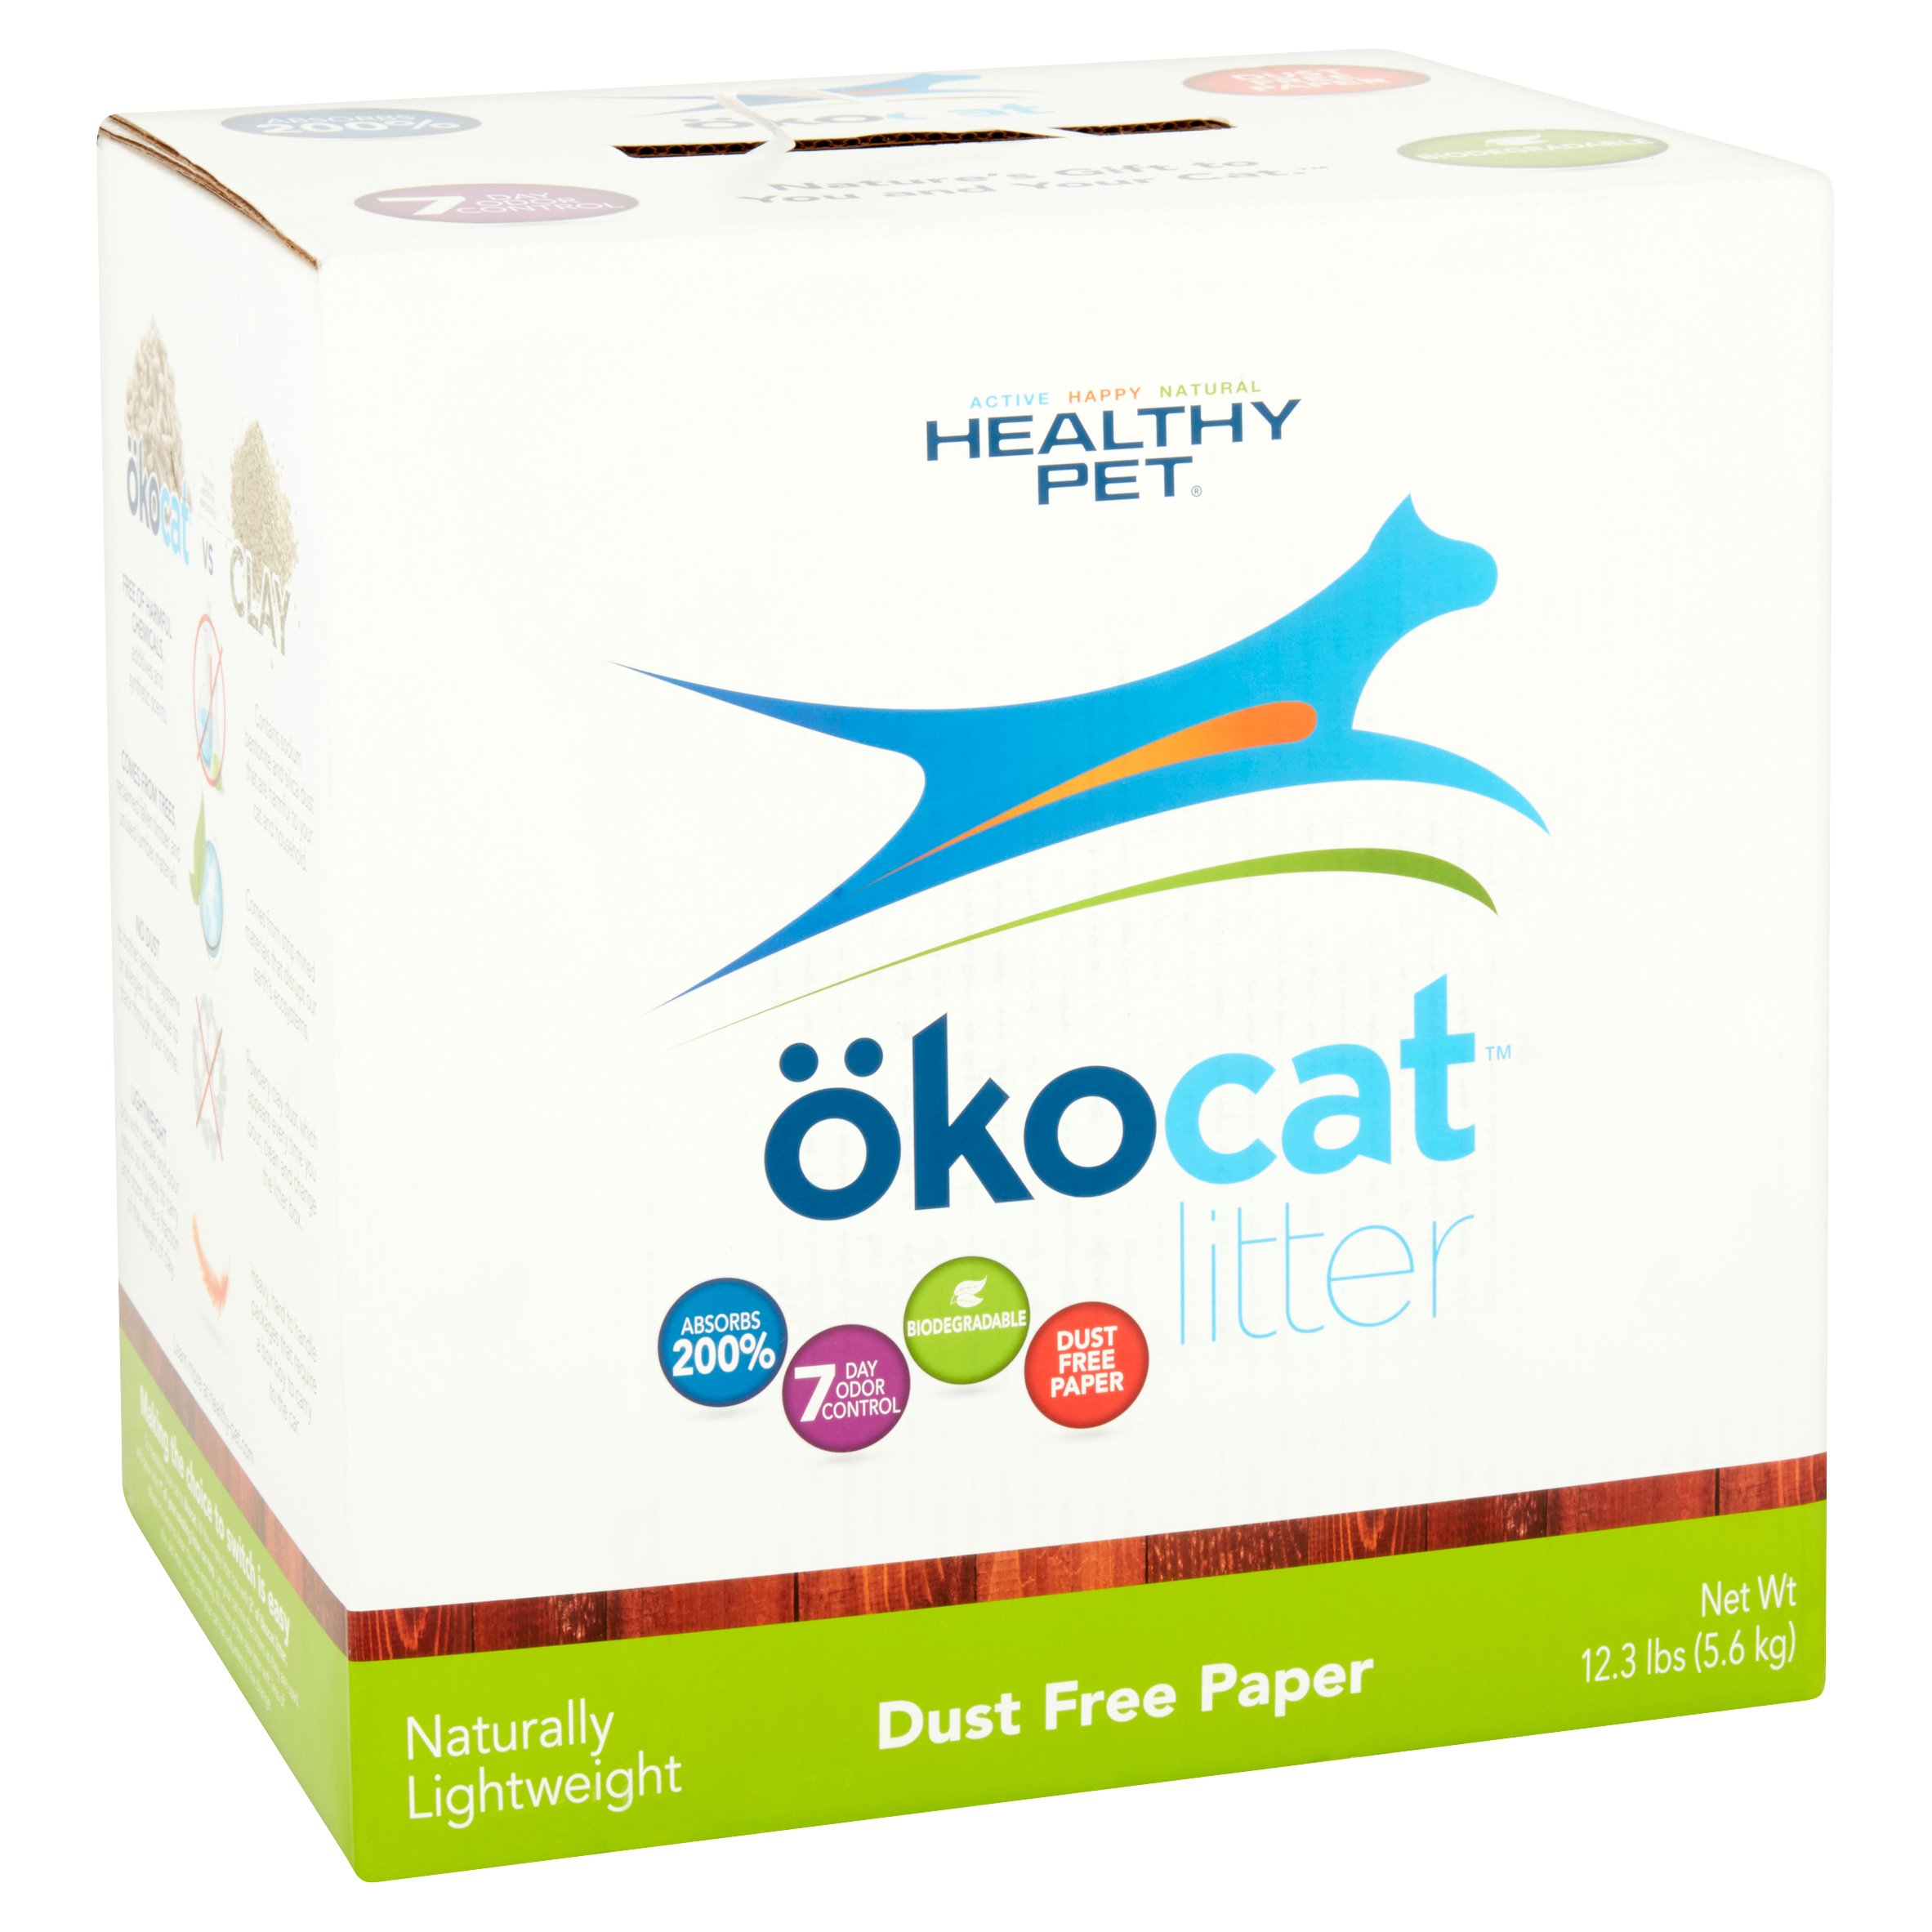 Okocat Dust Free Paper Cat Litter, 12.3-lb